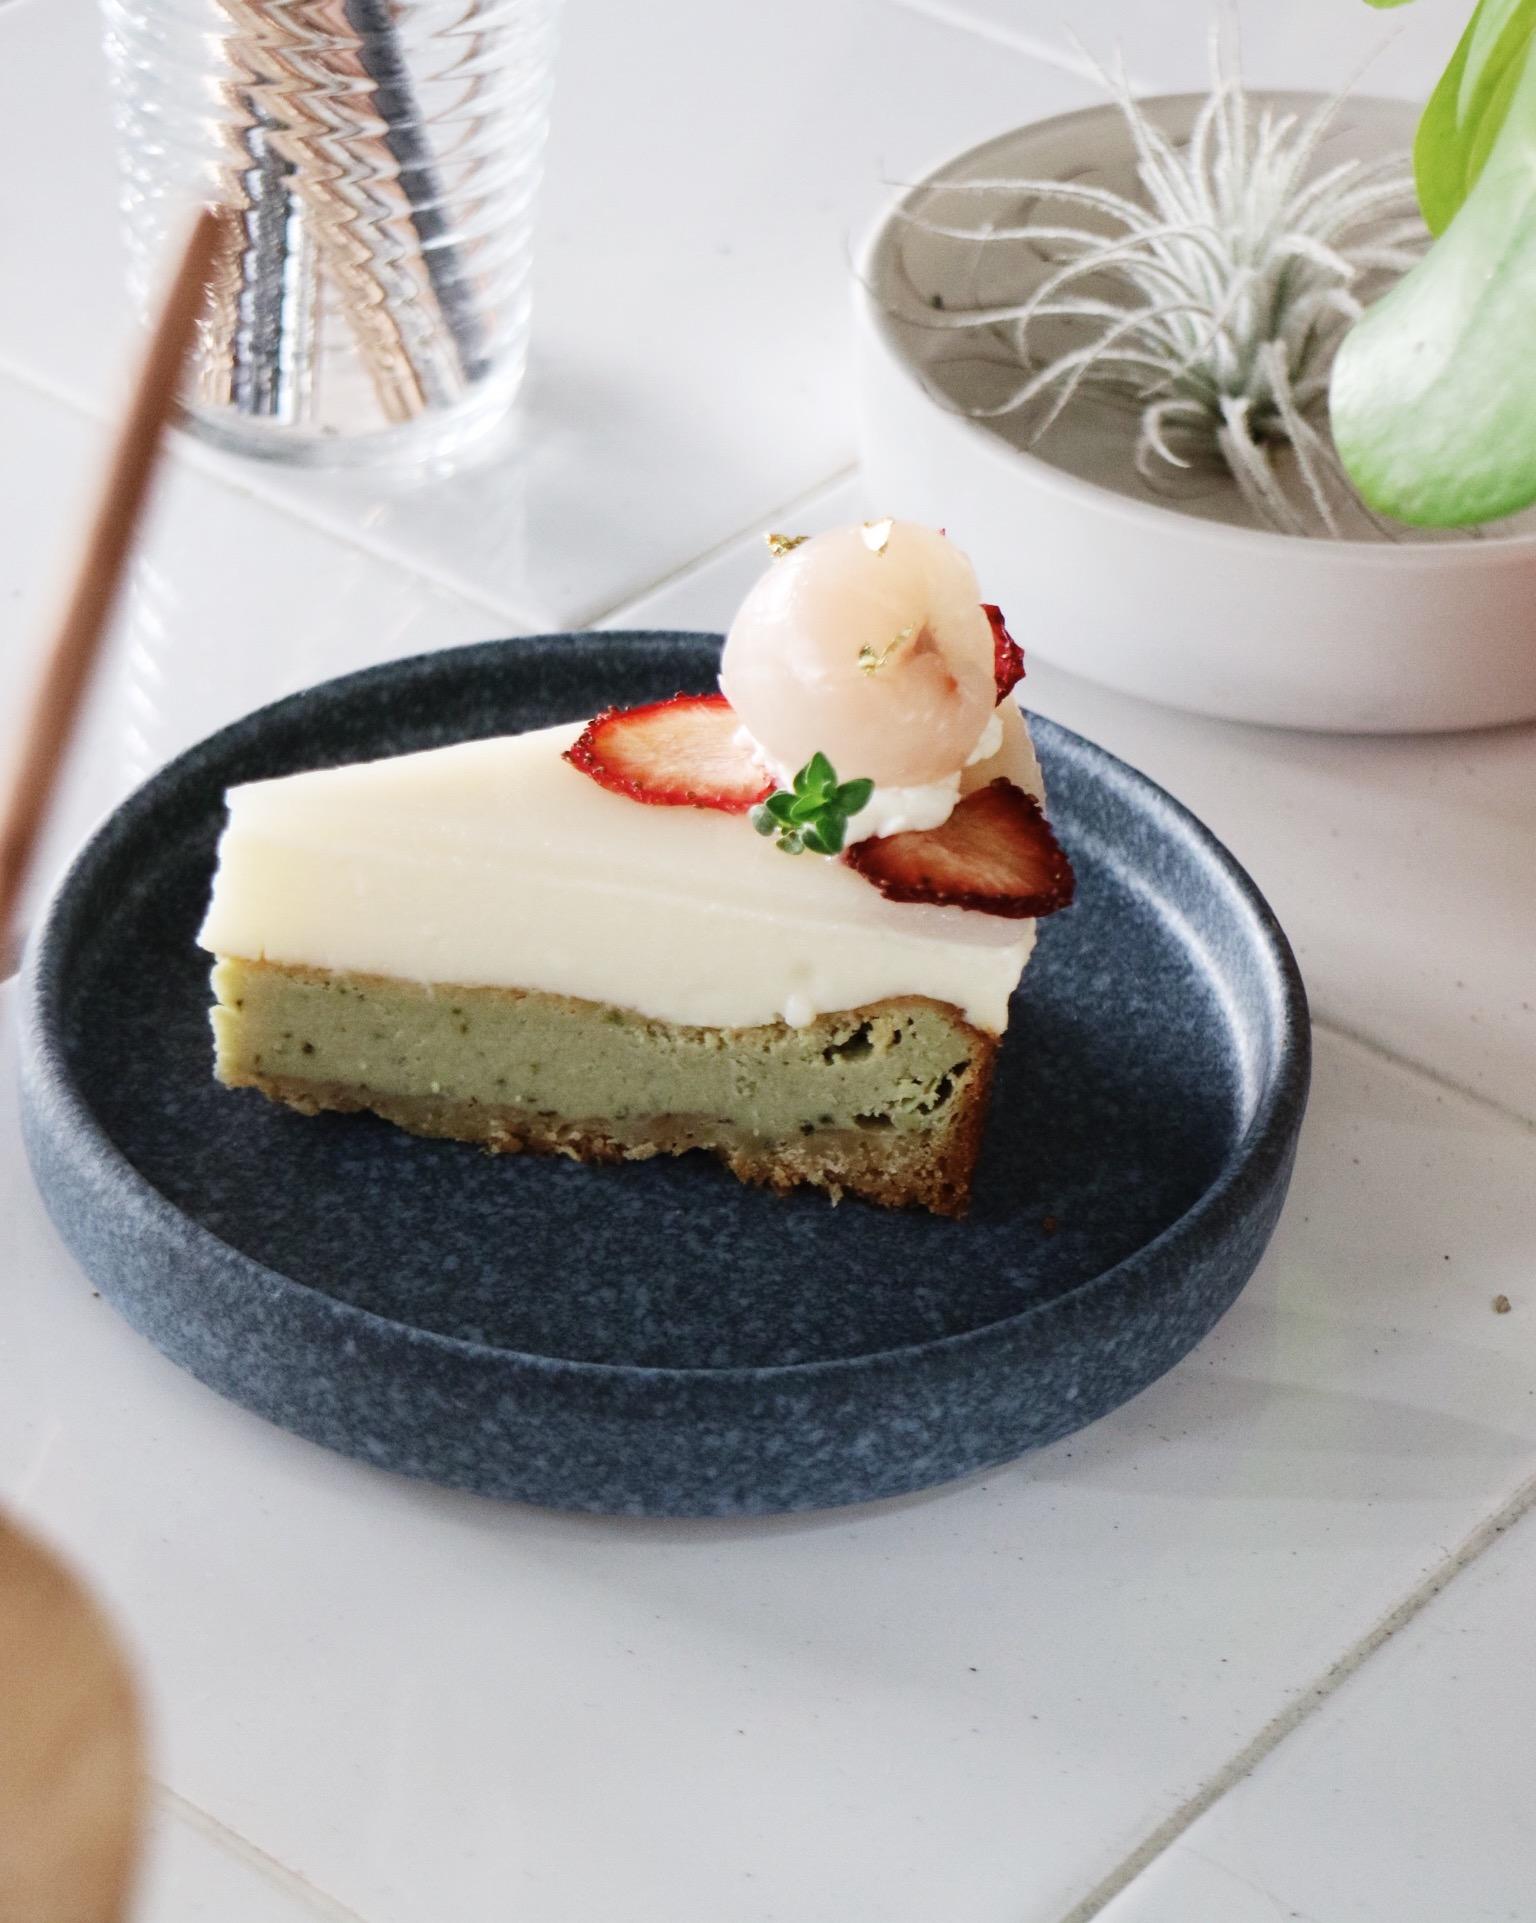 Lychee oolong cheesecake